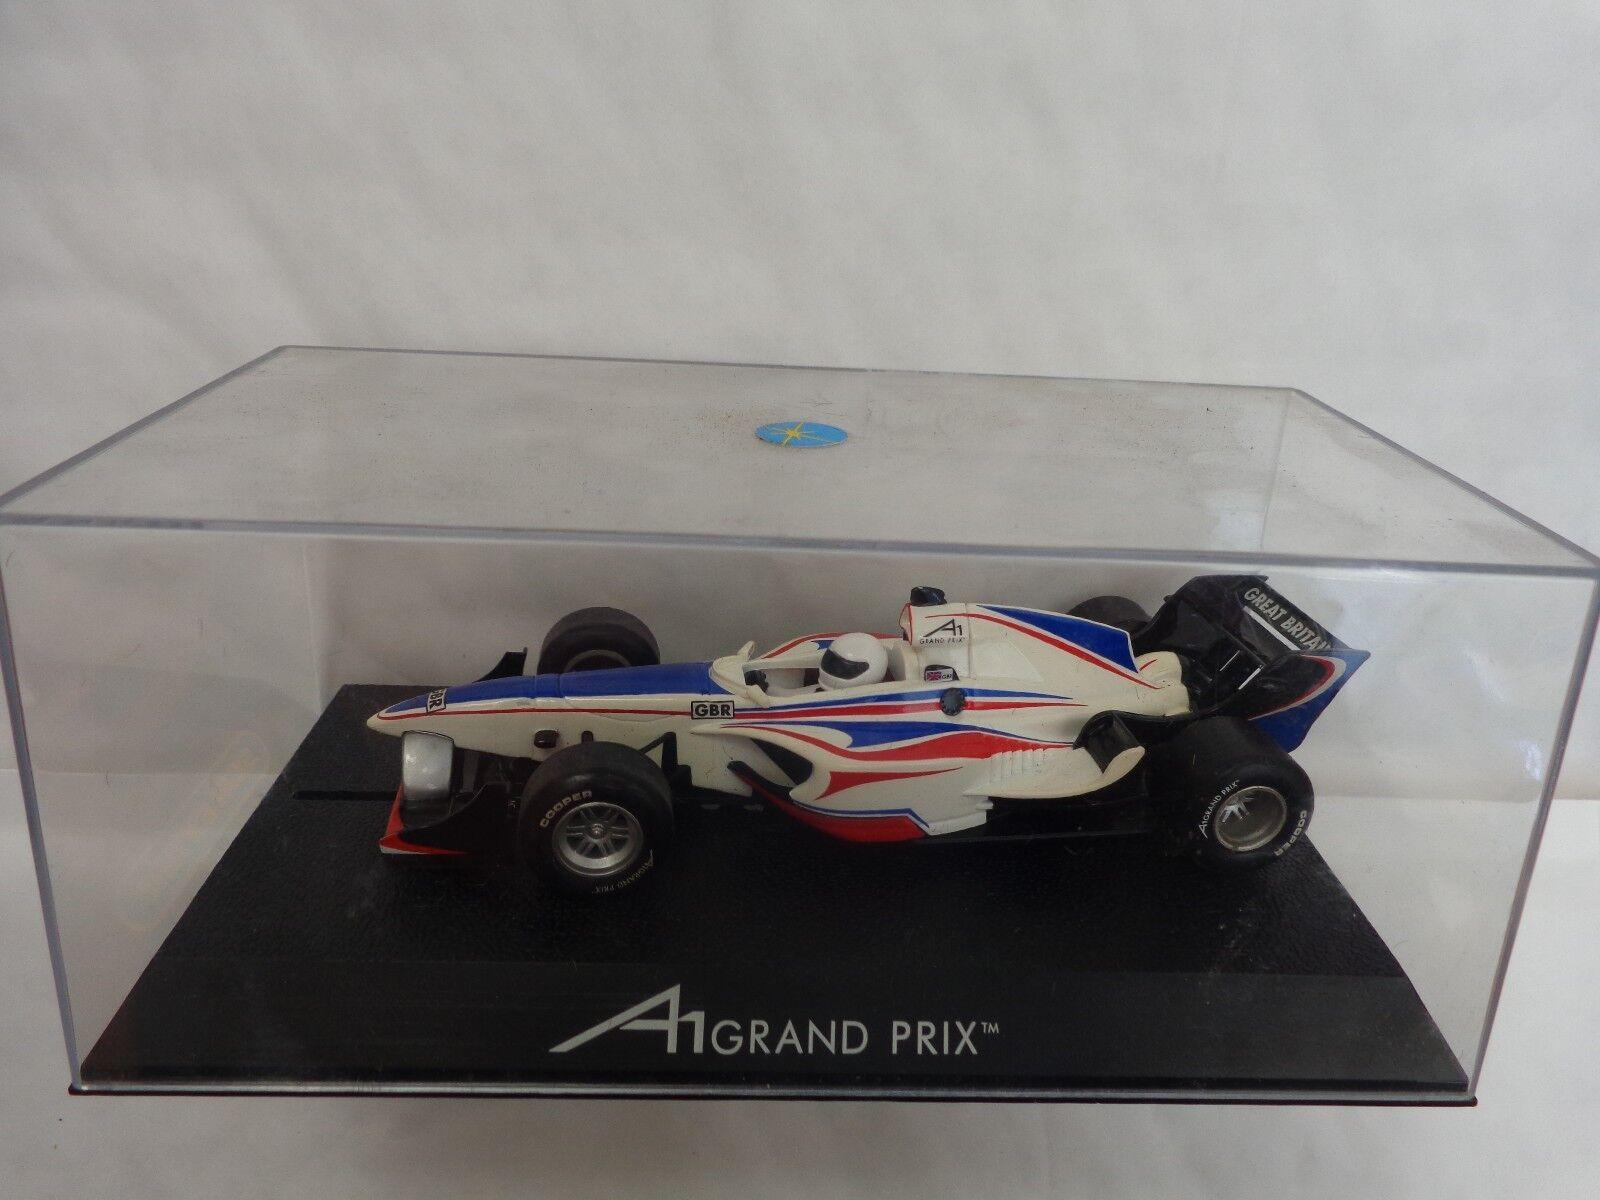 HORNBY SCALEXTRIC - A1 GRAND PRIX TEAM GREAT BRITAIN F1 CAR C2706 BOXED